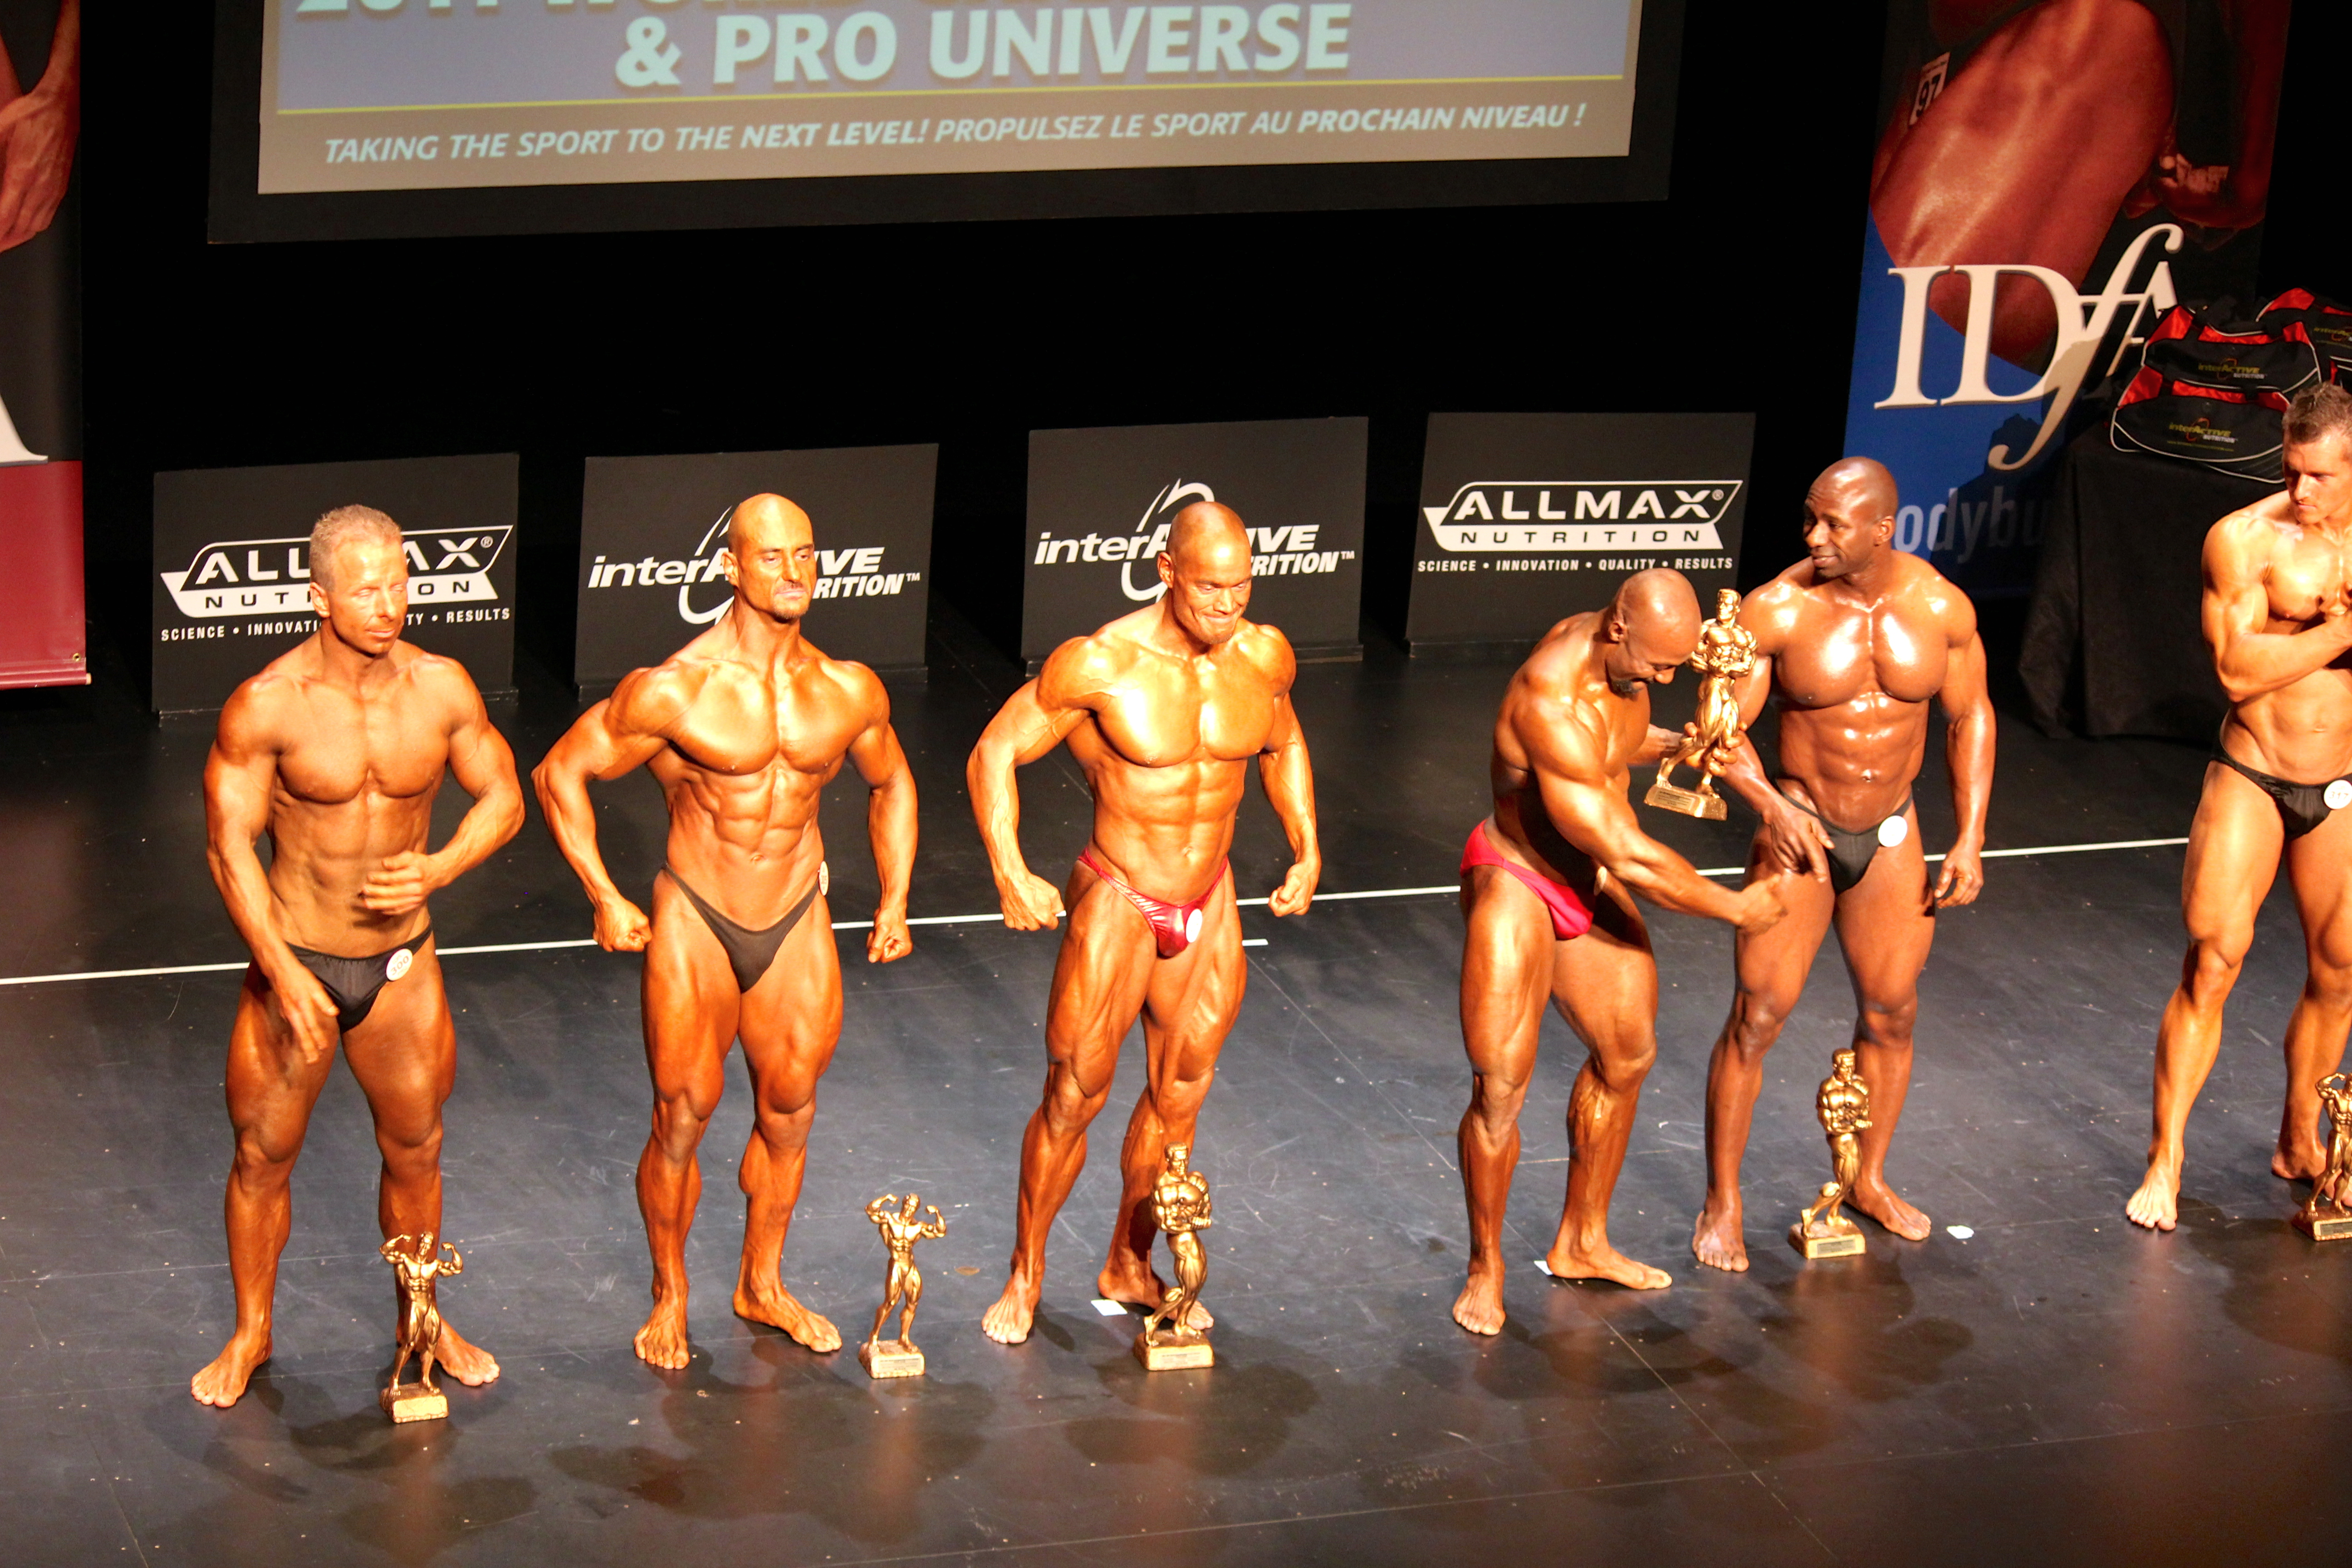 2011 Pro Universe.